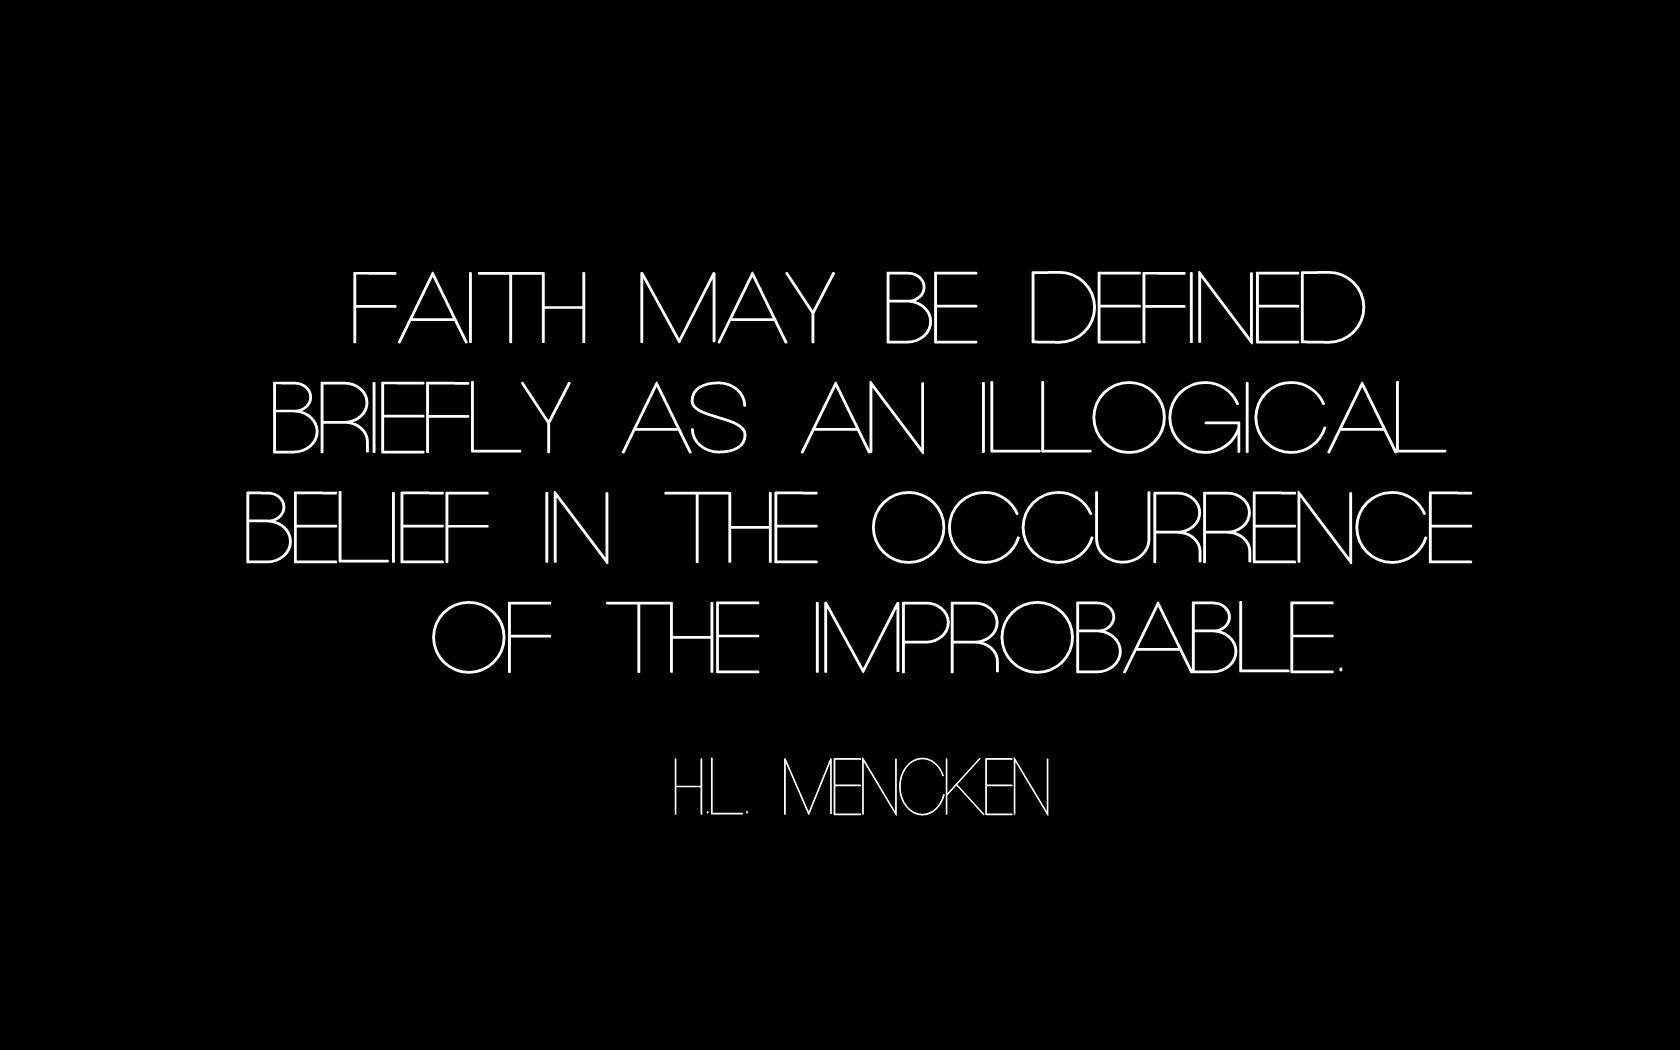 Faith text quotes atheism H_L_ Mencken wallpaper ...